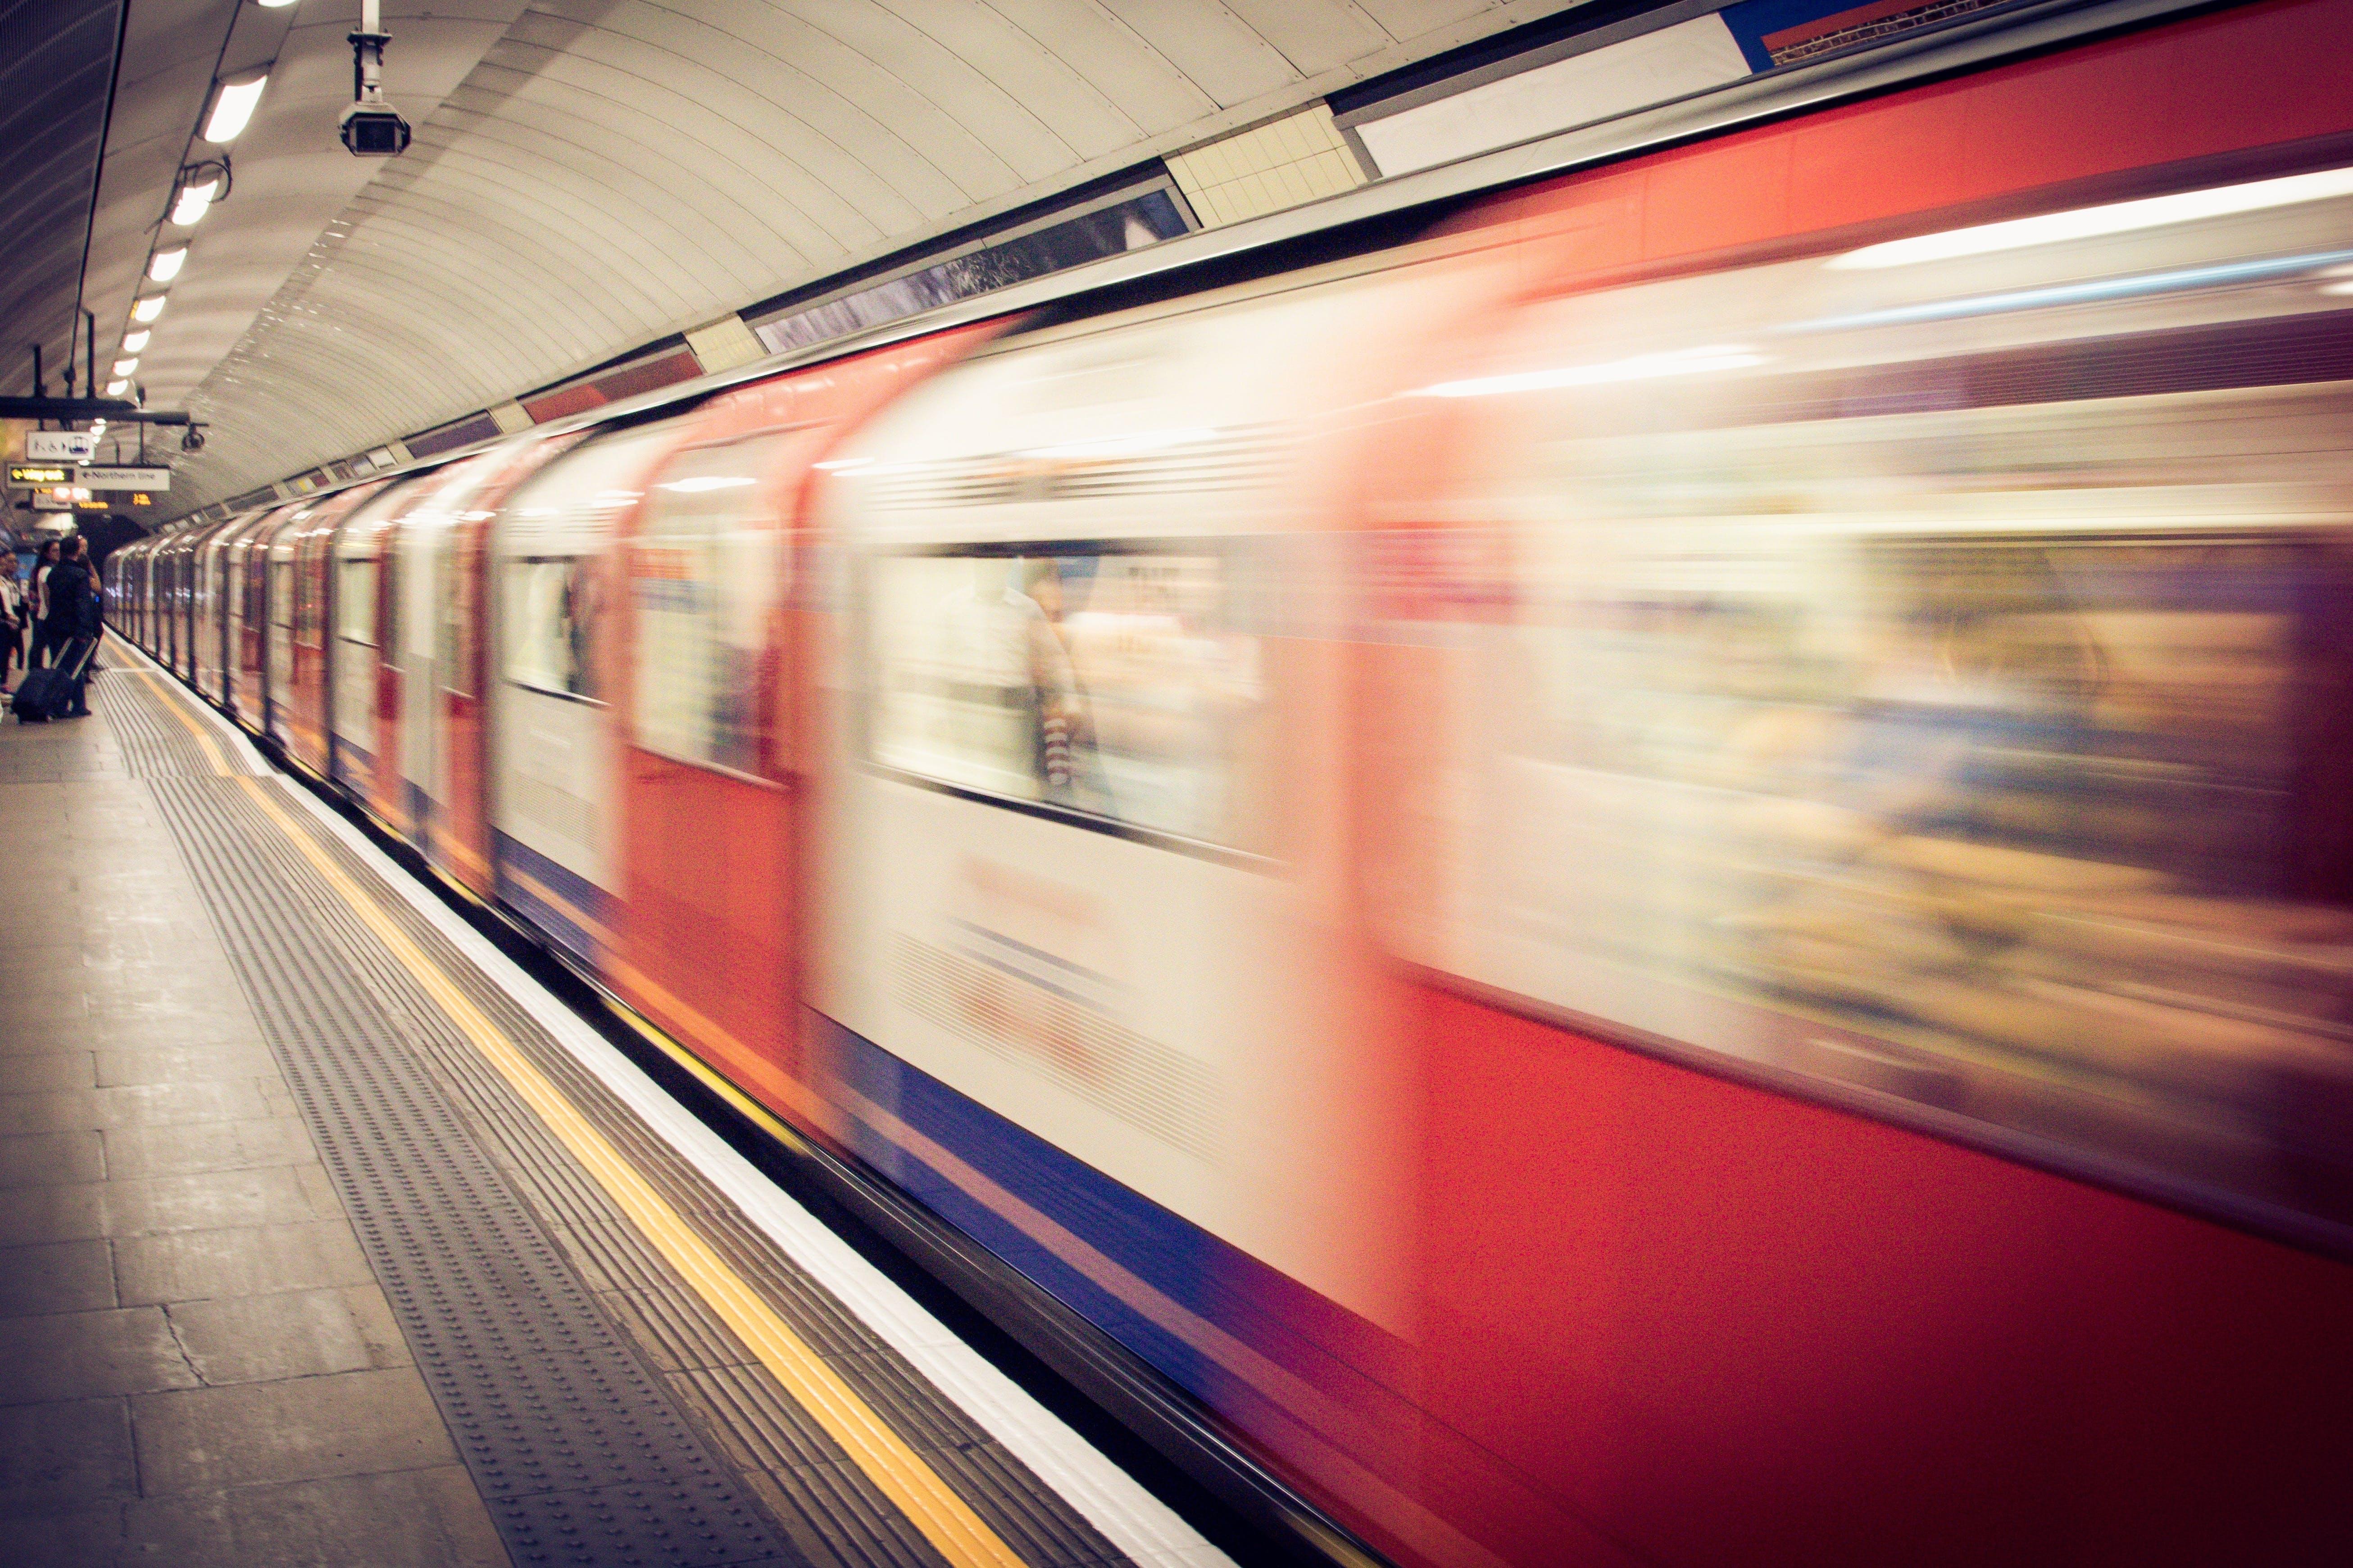 Free stock photo of people, train, motion, underground